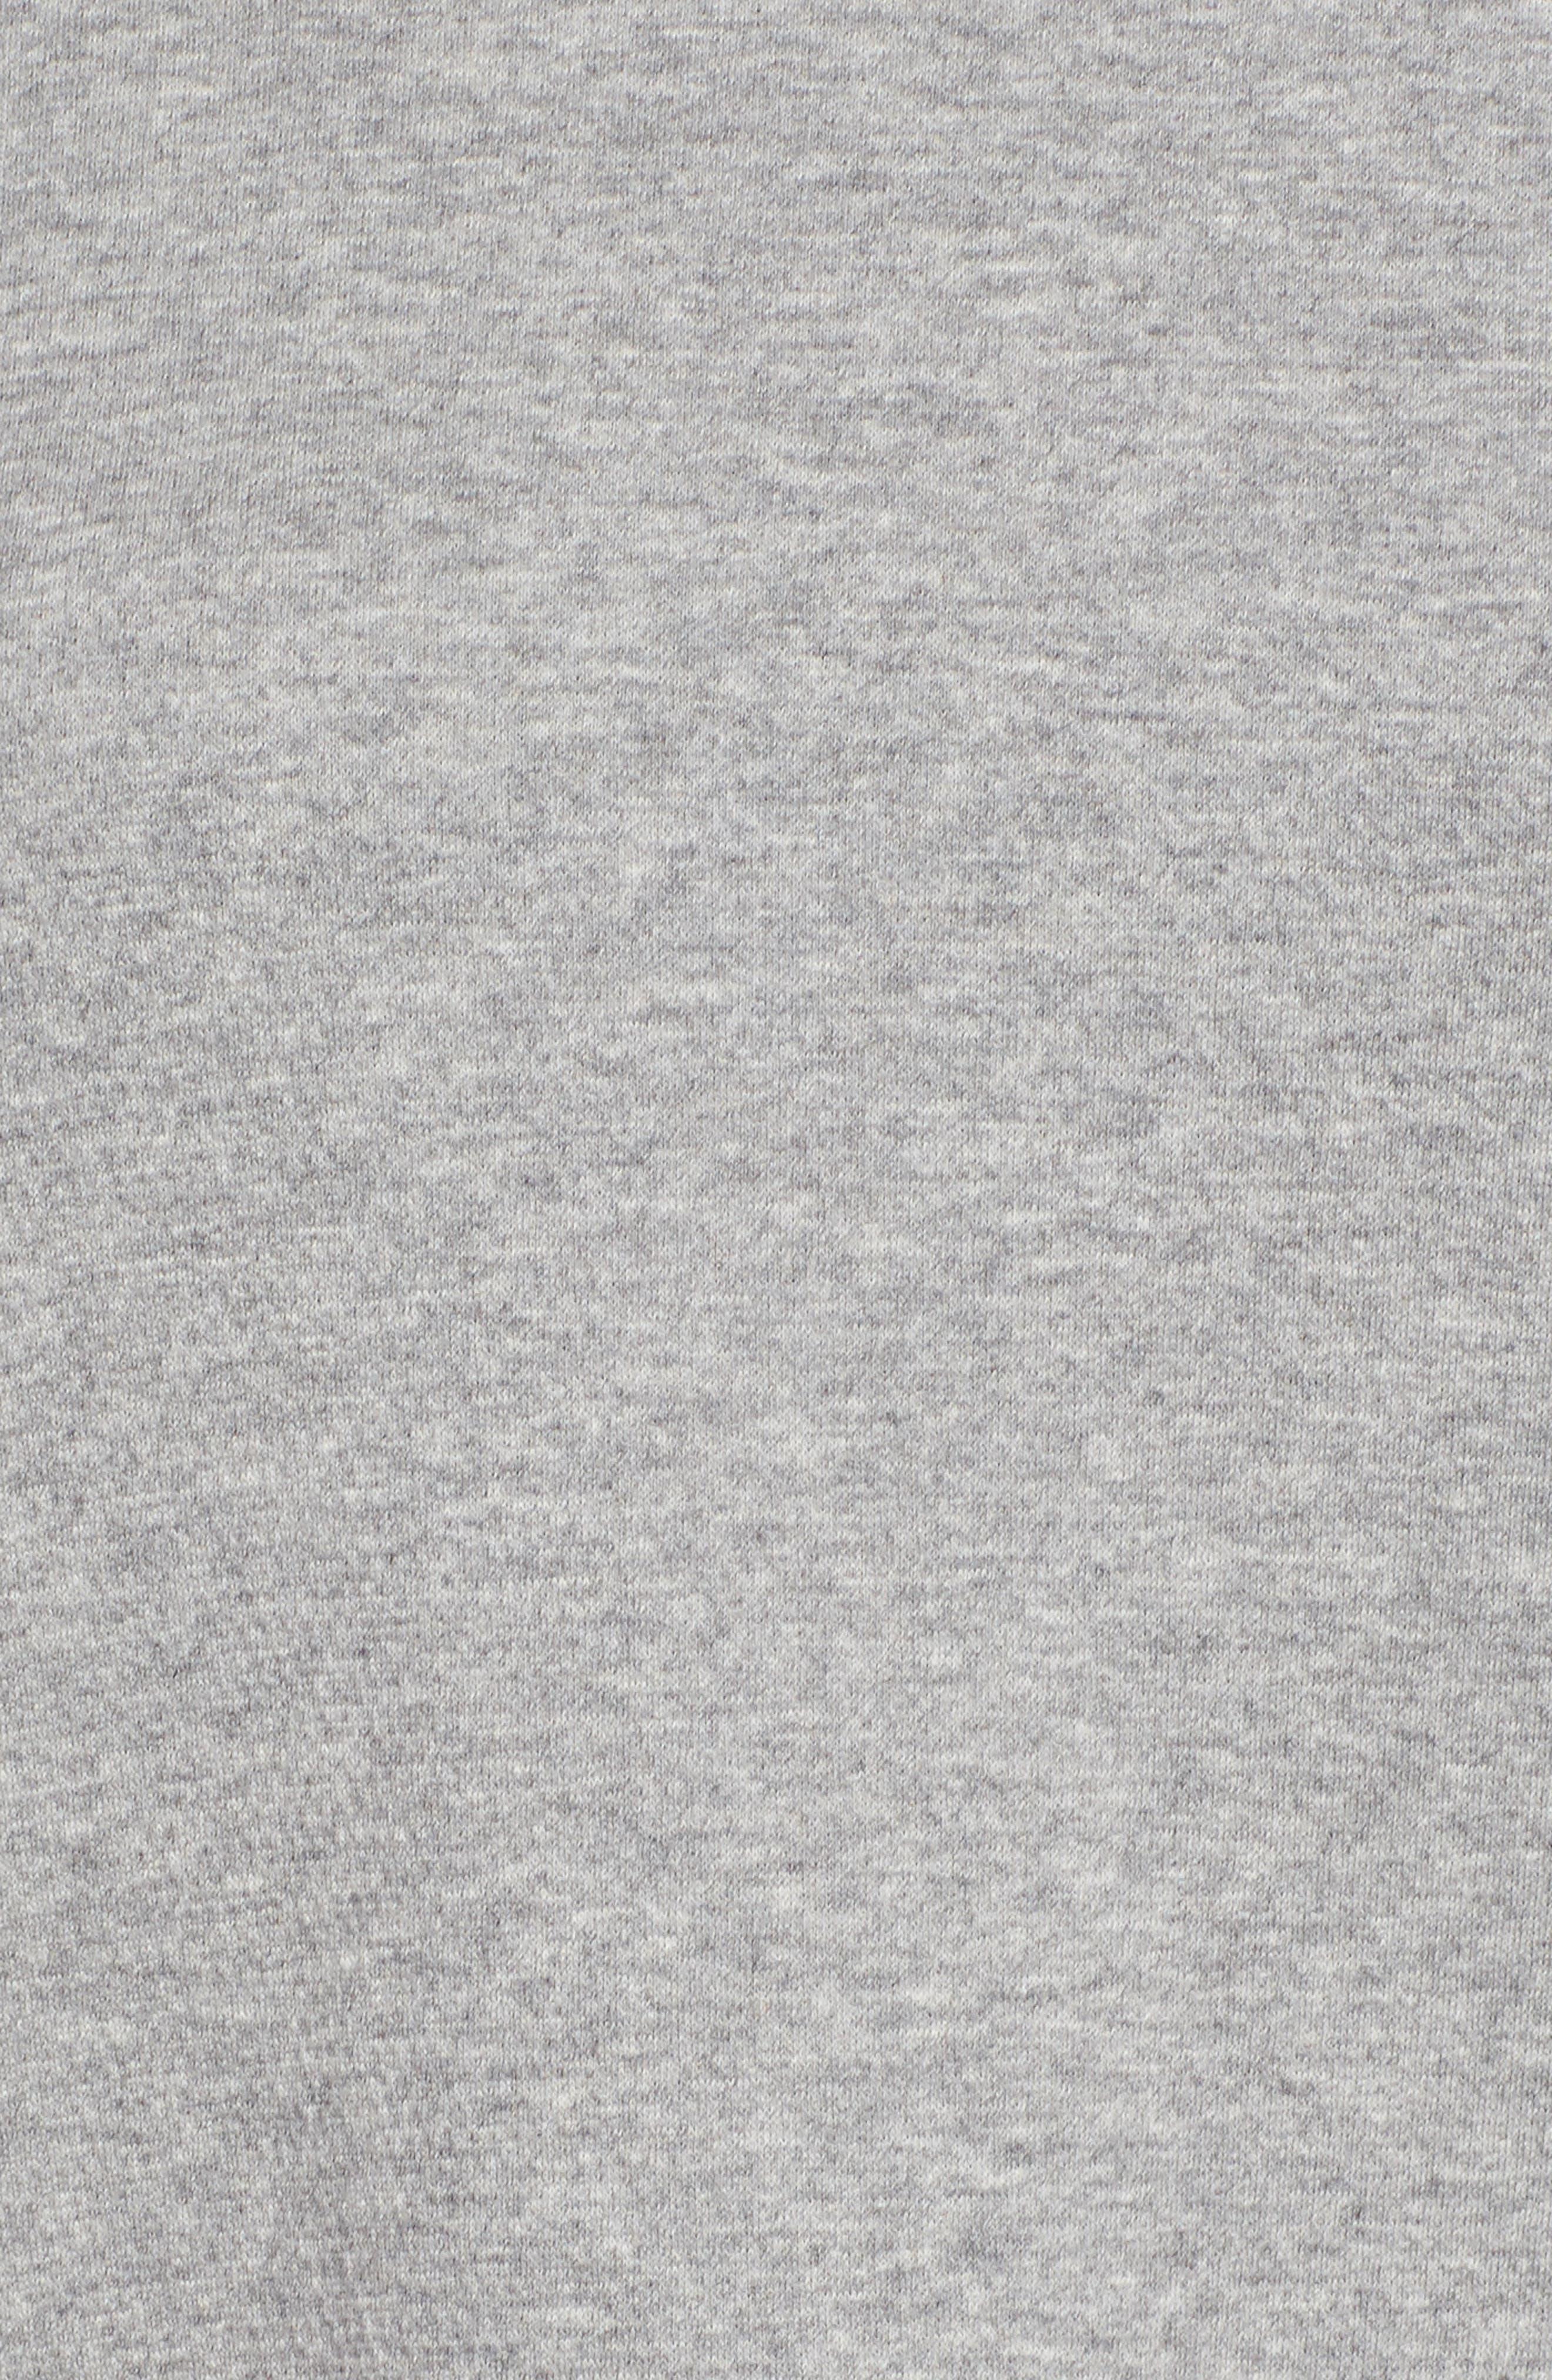 Double Knit Organic Cotton Tunic,                             Alternate thumbnail 5, color,                             022